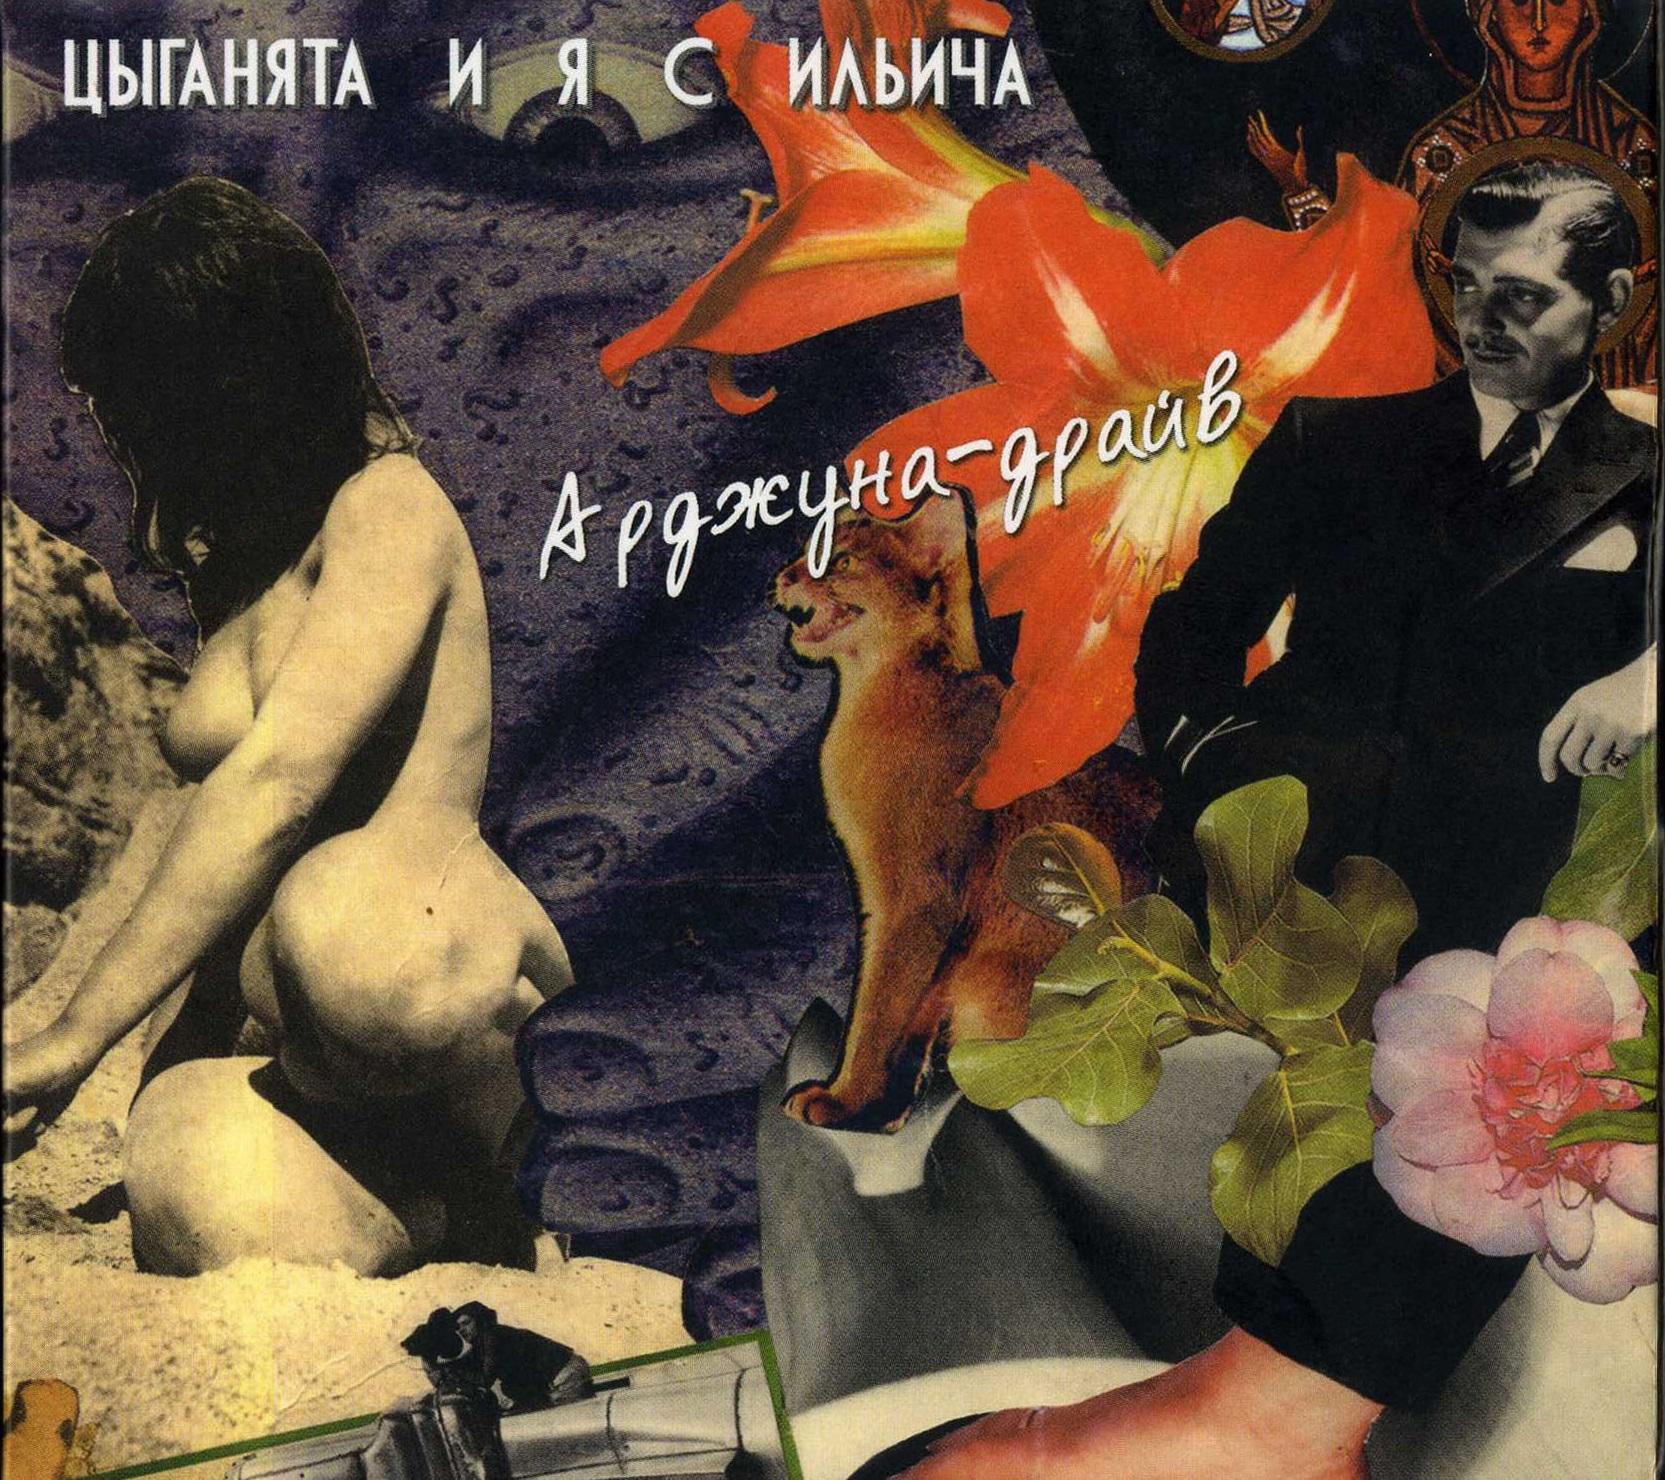 Цыганята и я с Ильича — Арджуна-Драйв (1990)